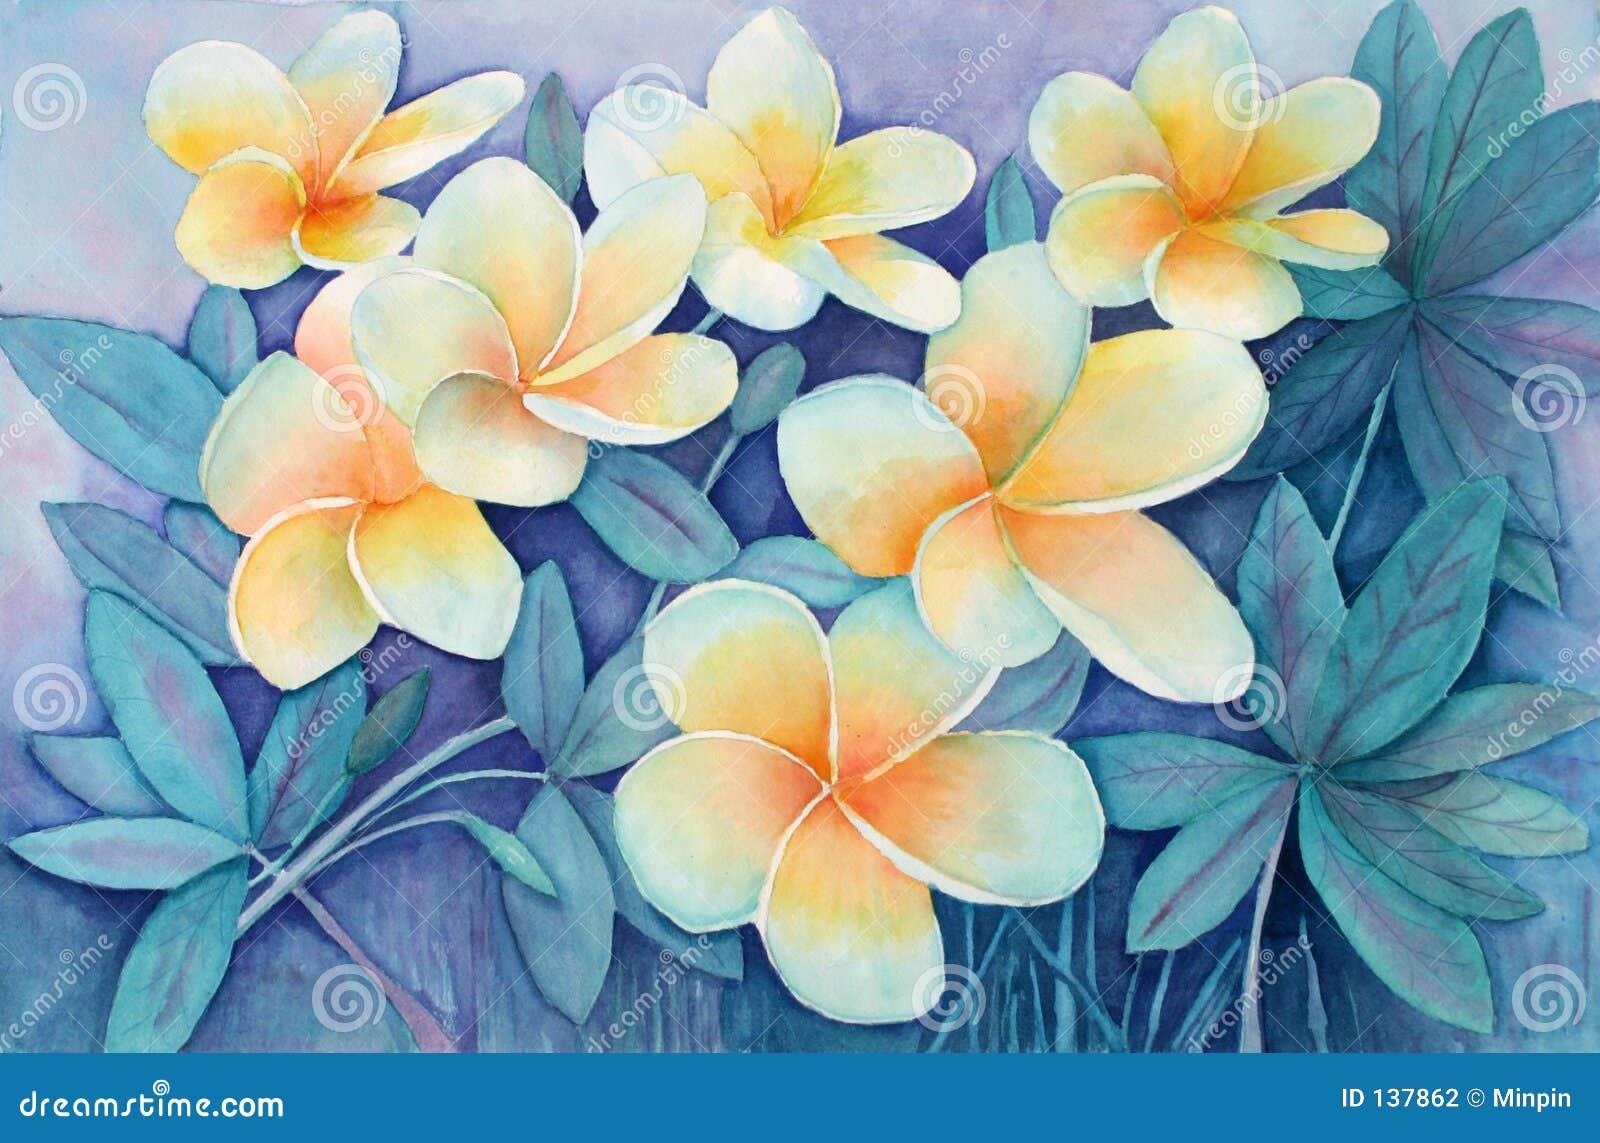 Original watercolor I painted of yellow tropical frangipani flowers ...